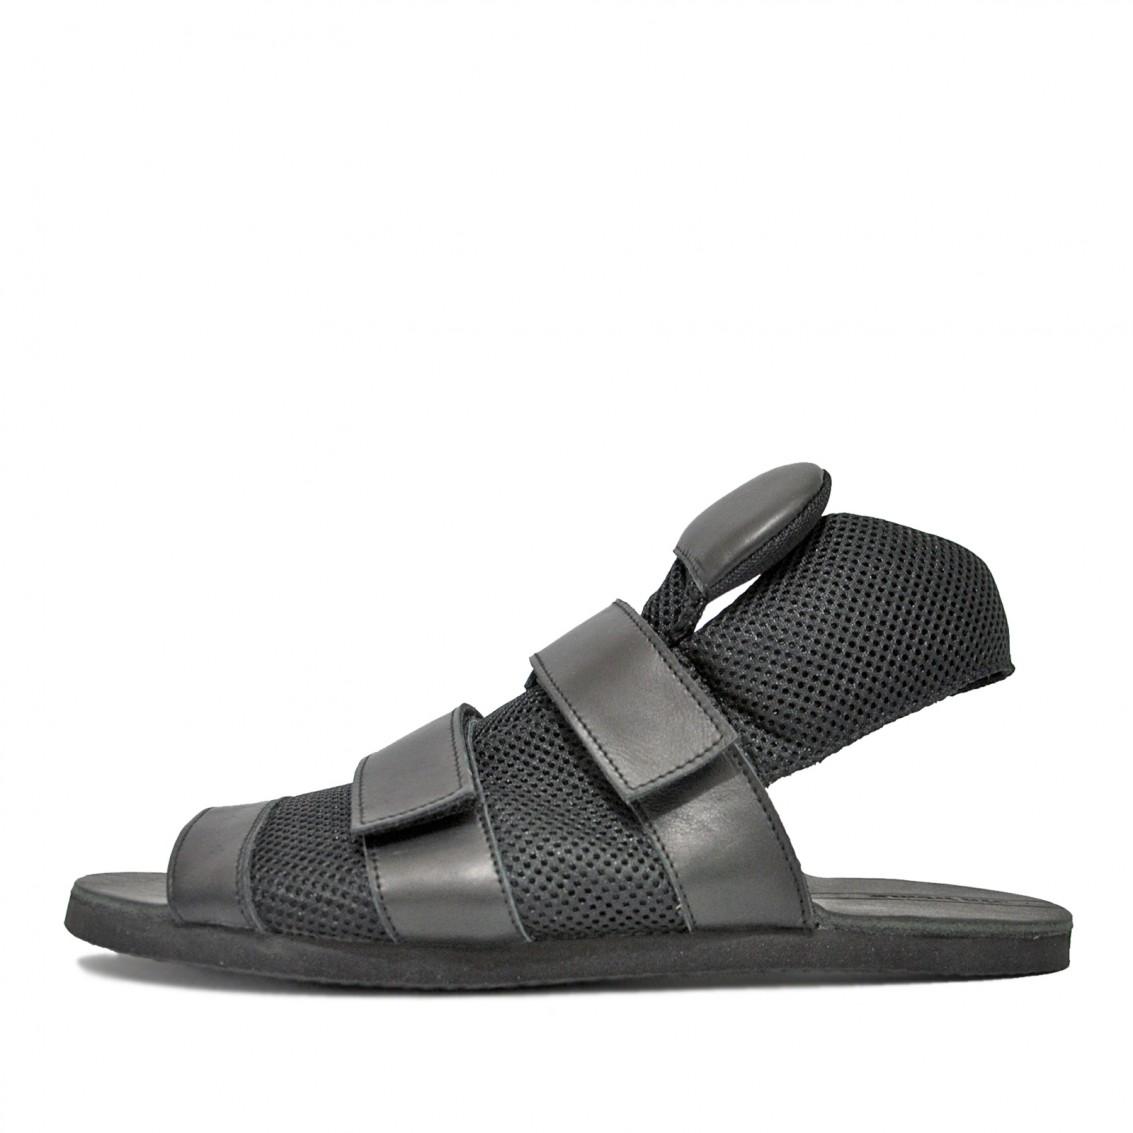 Men's asymmetric  sandals. Conceptual model.